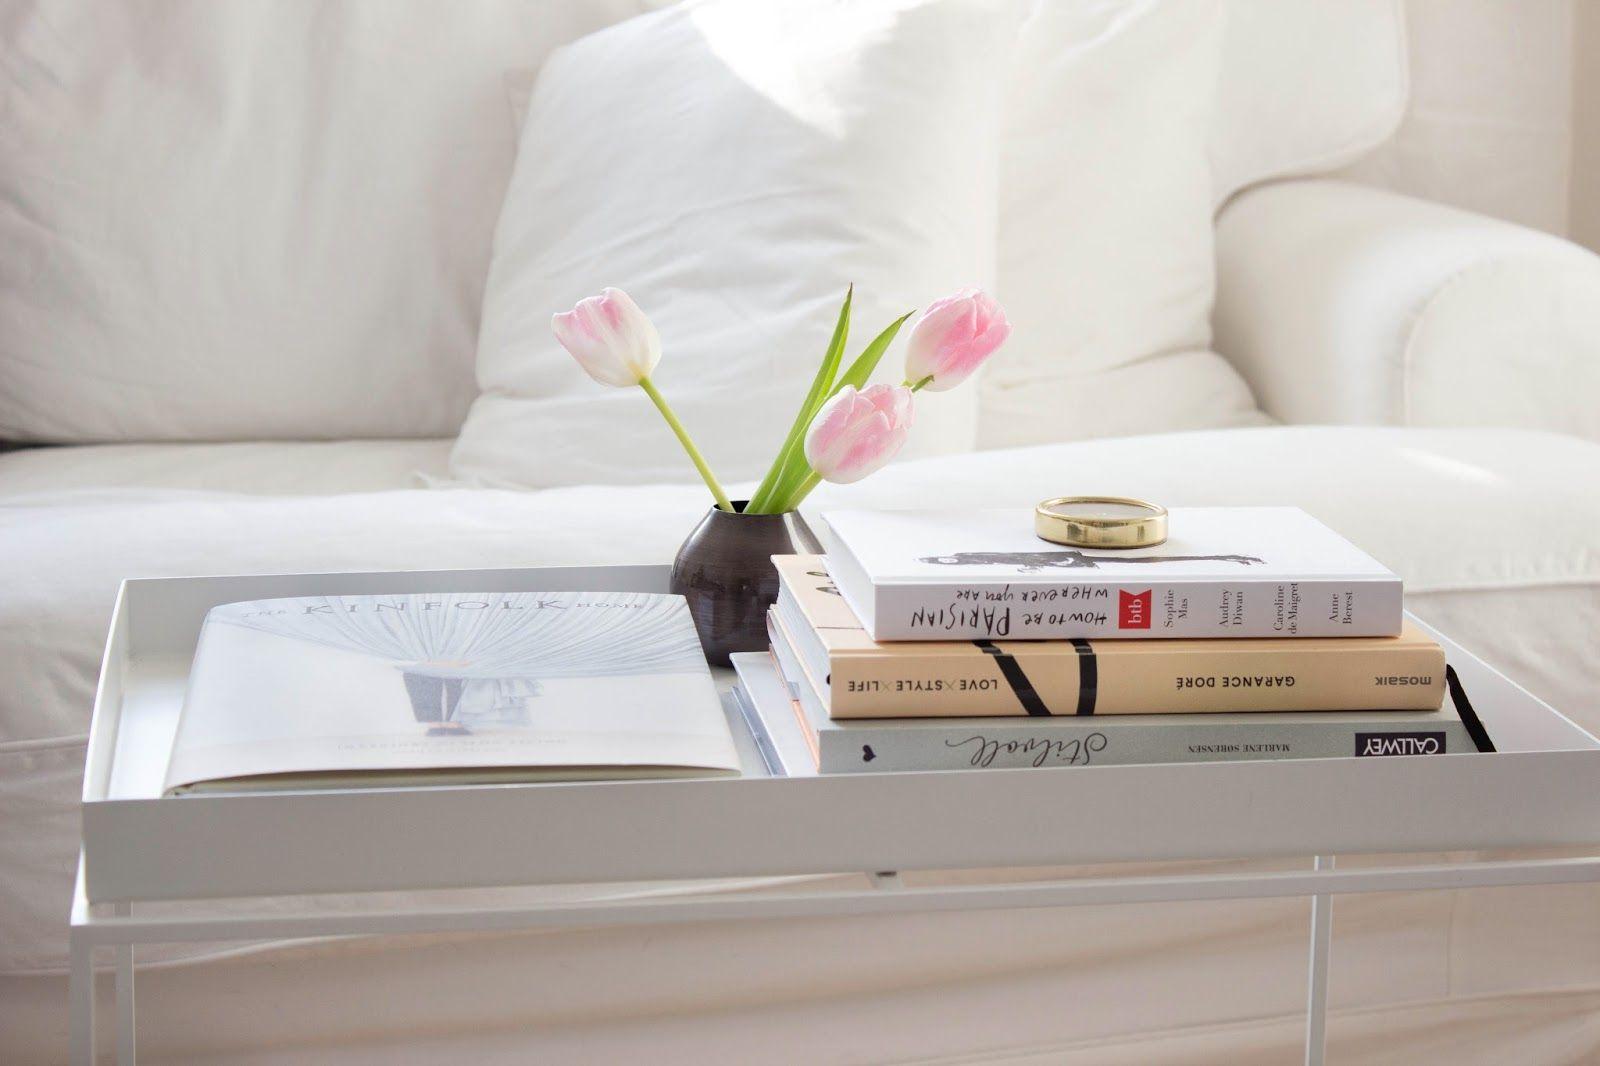 Die besten Coffee-Table Books   Pinterest   Dekoration, Coffee and Haus